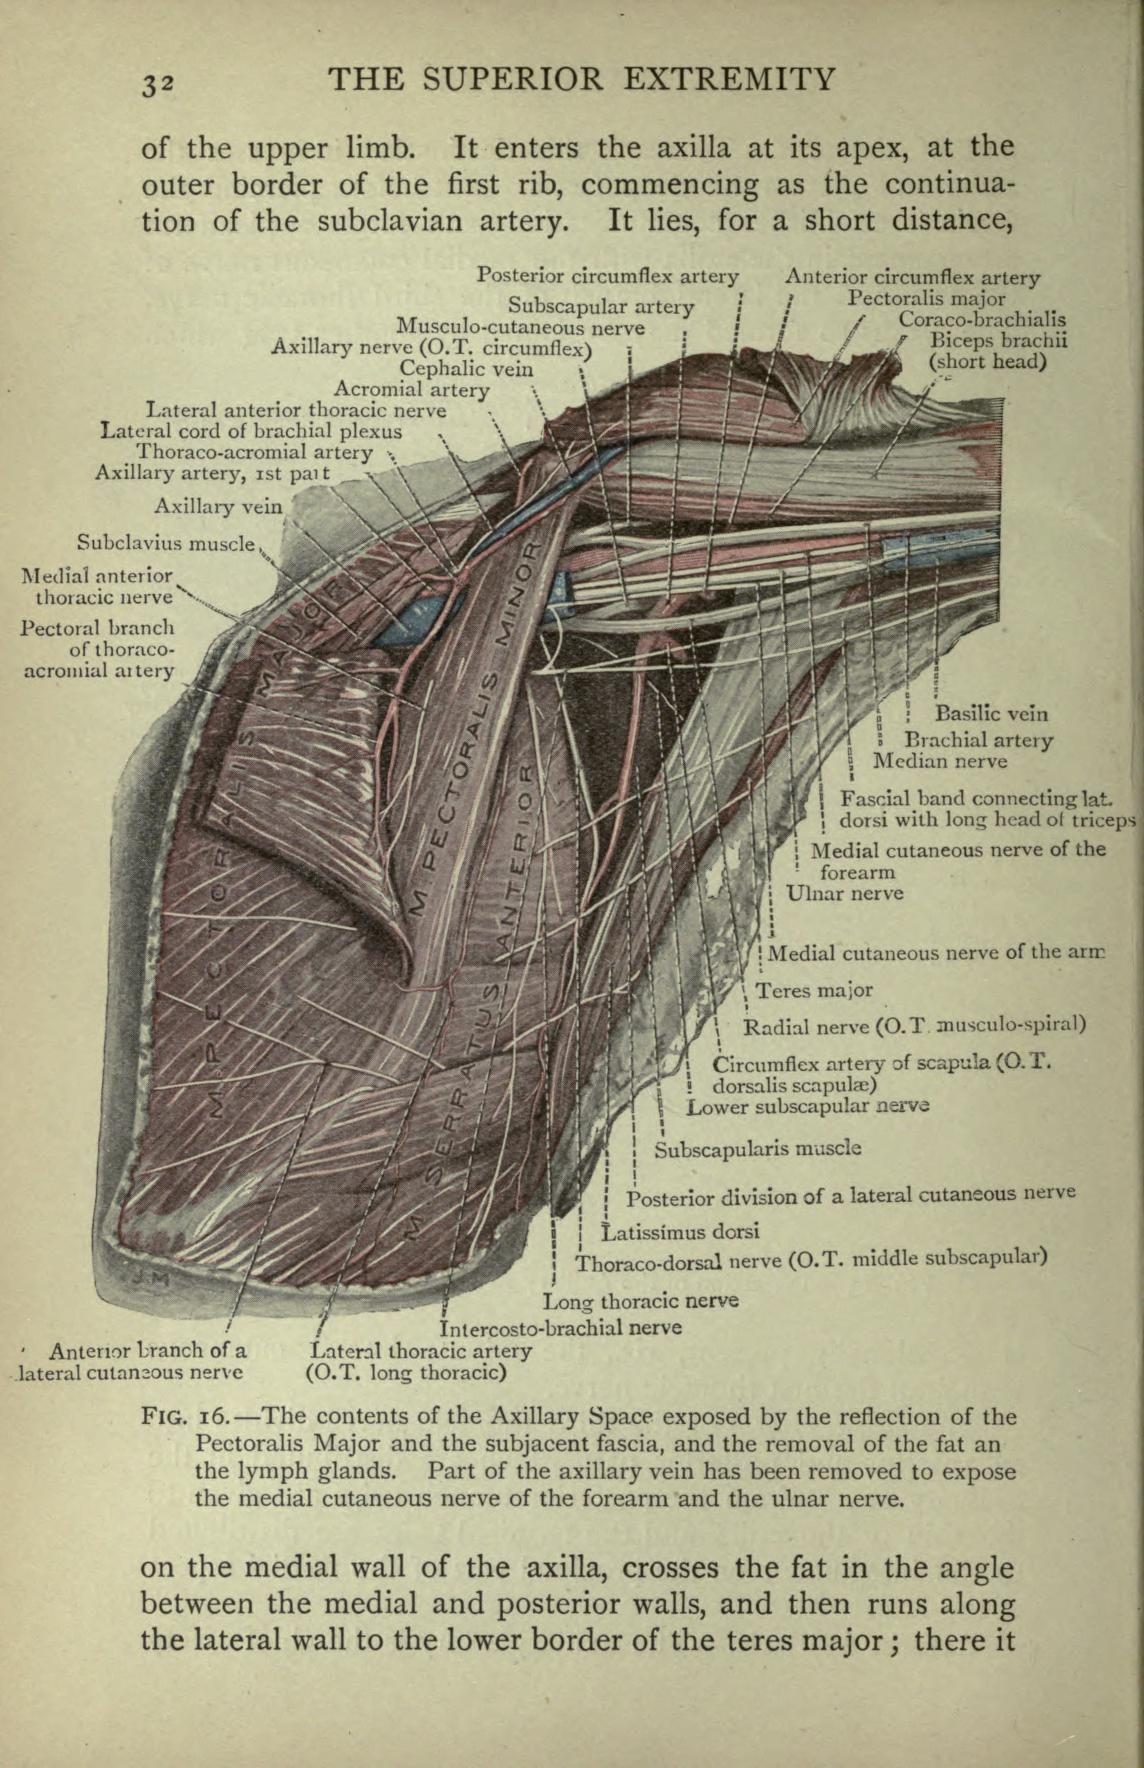 Coronary Arteries Manual Guide